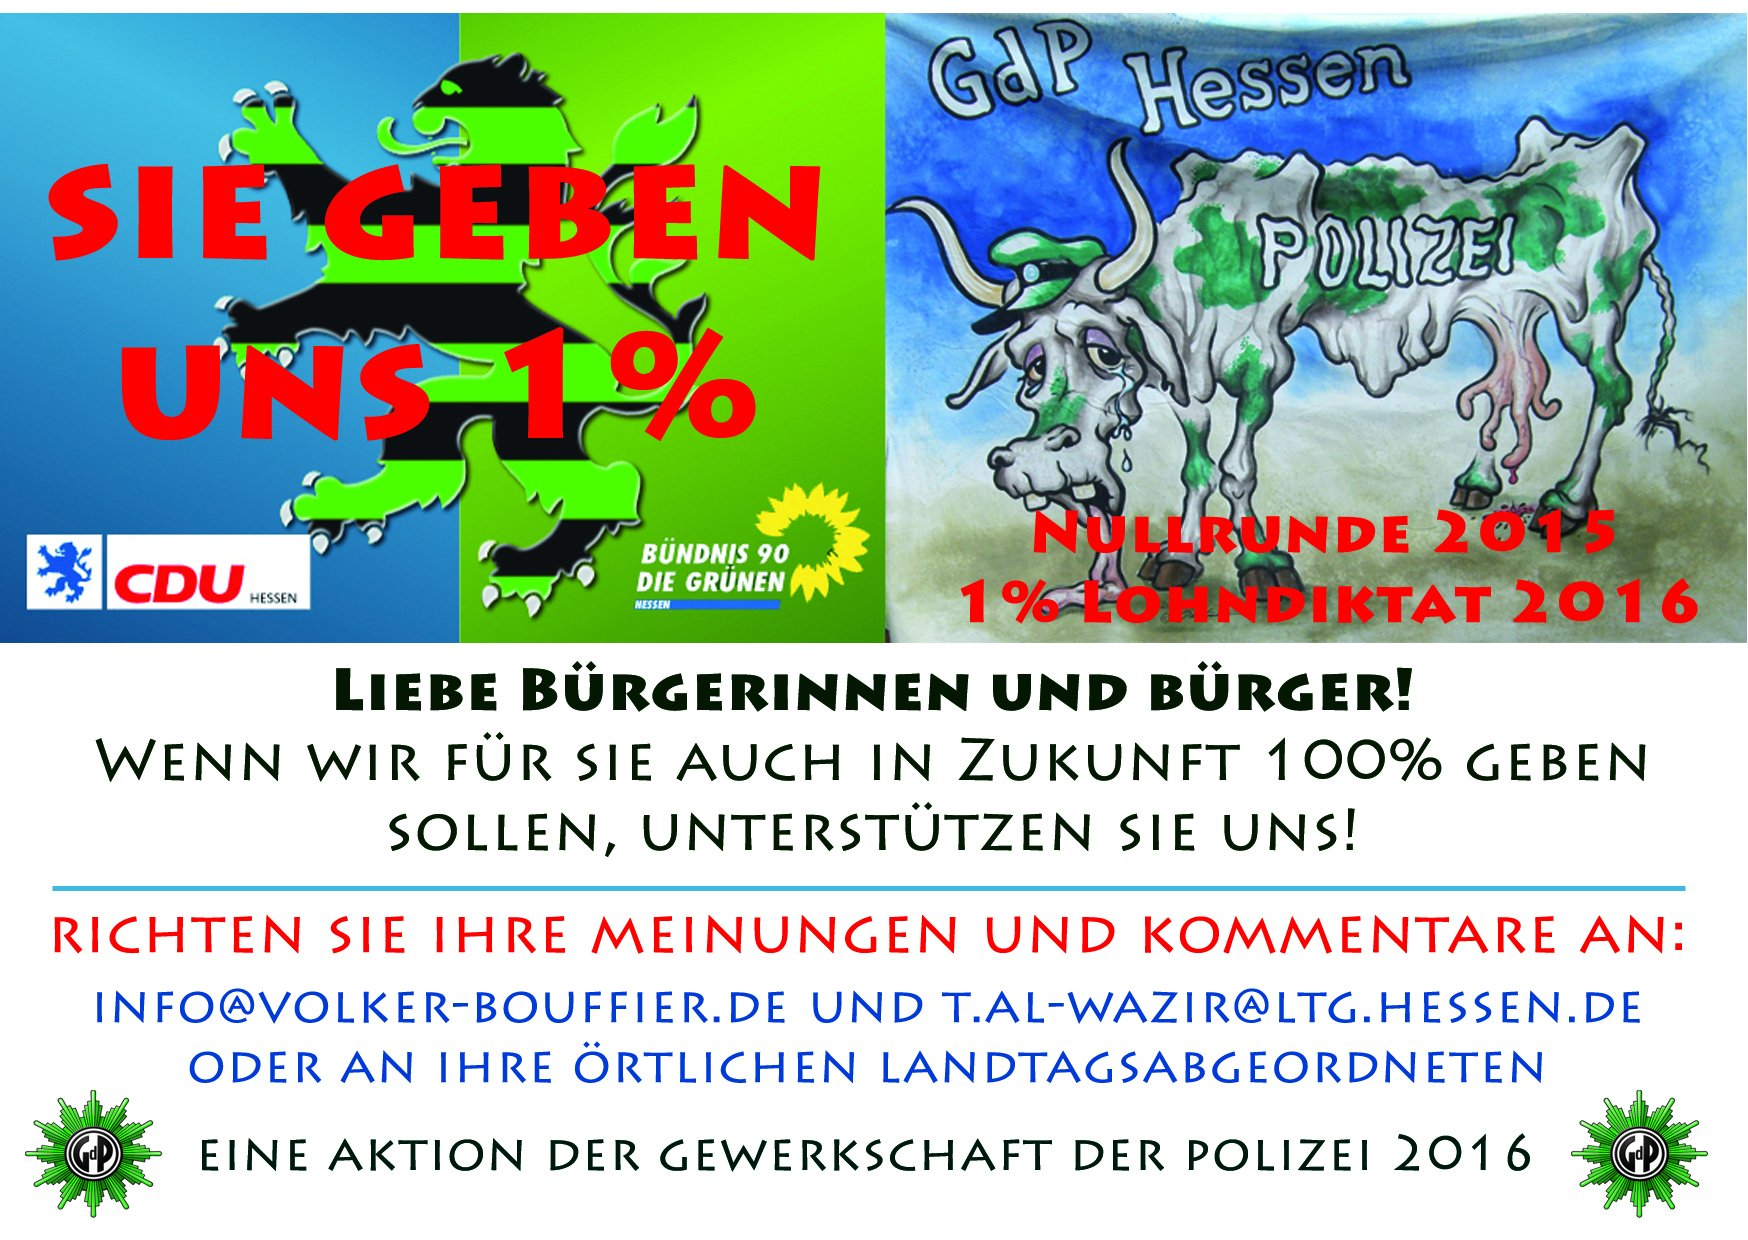 Facebook Gdp Hessen